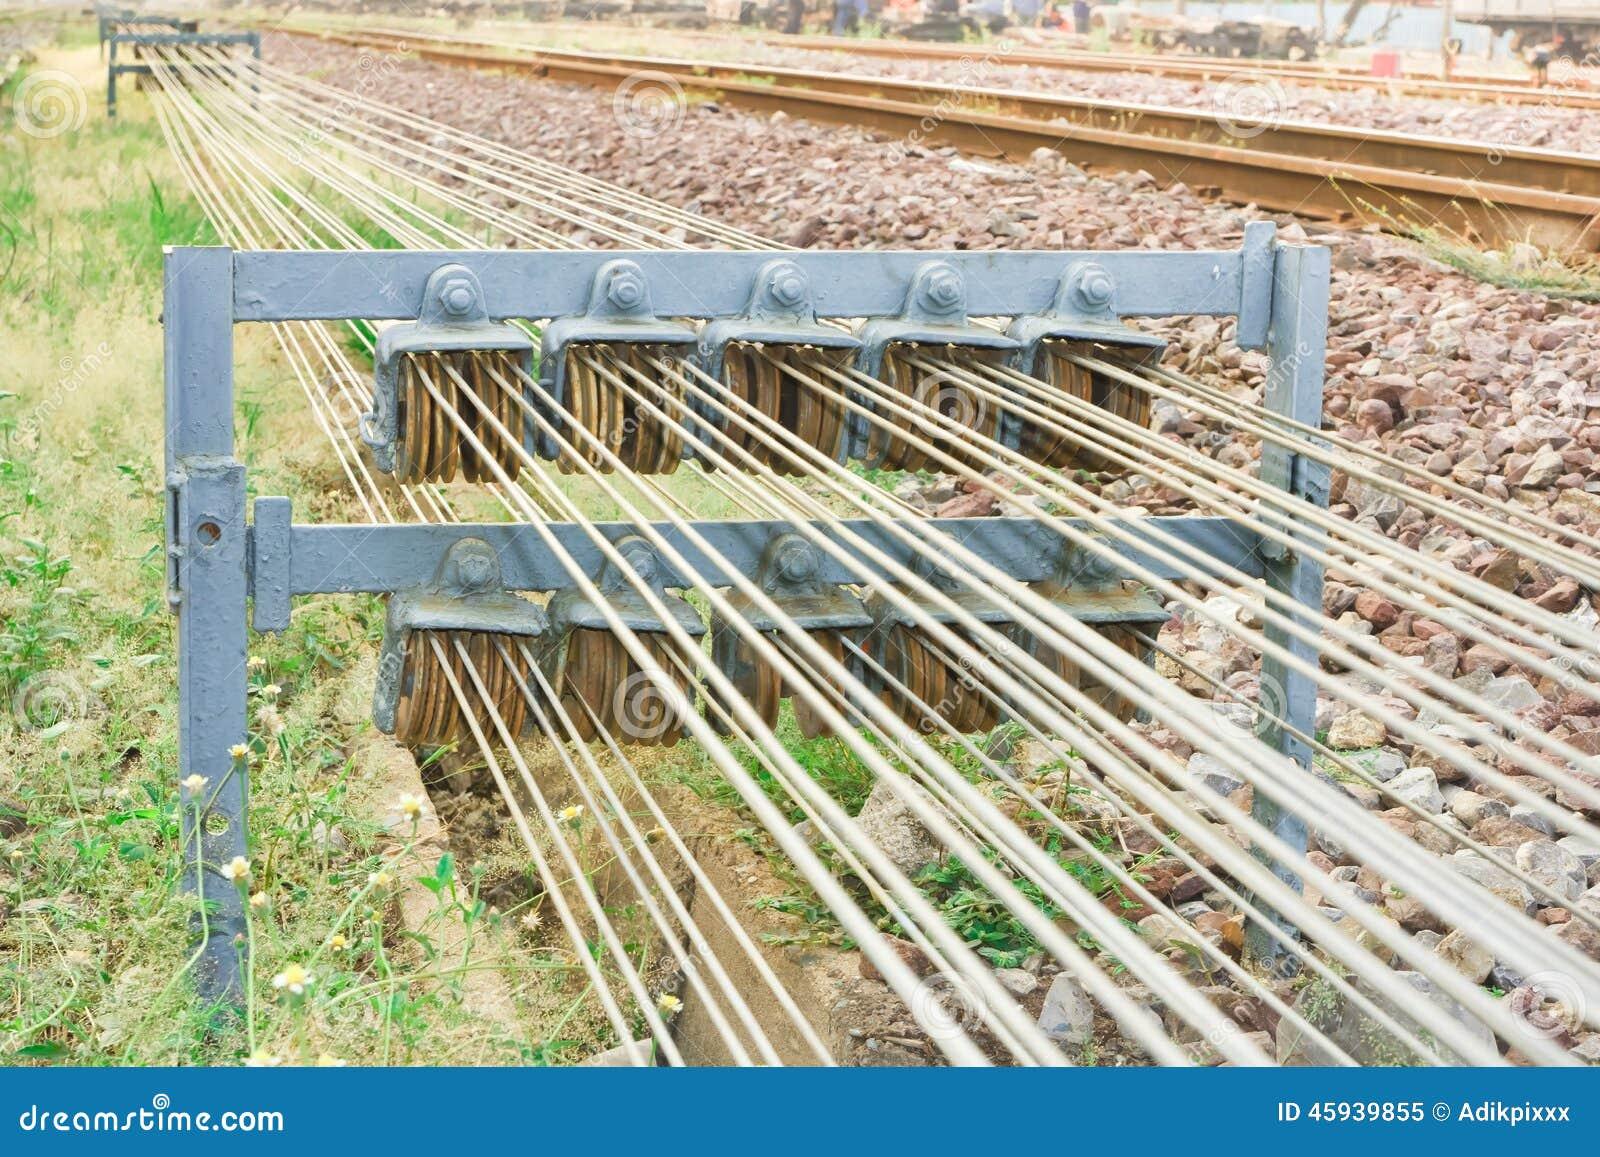 Shunt equipments. stock image. Image of device, railway - 45939855